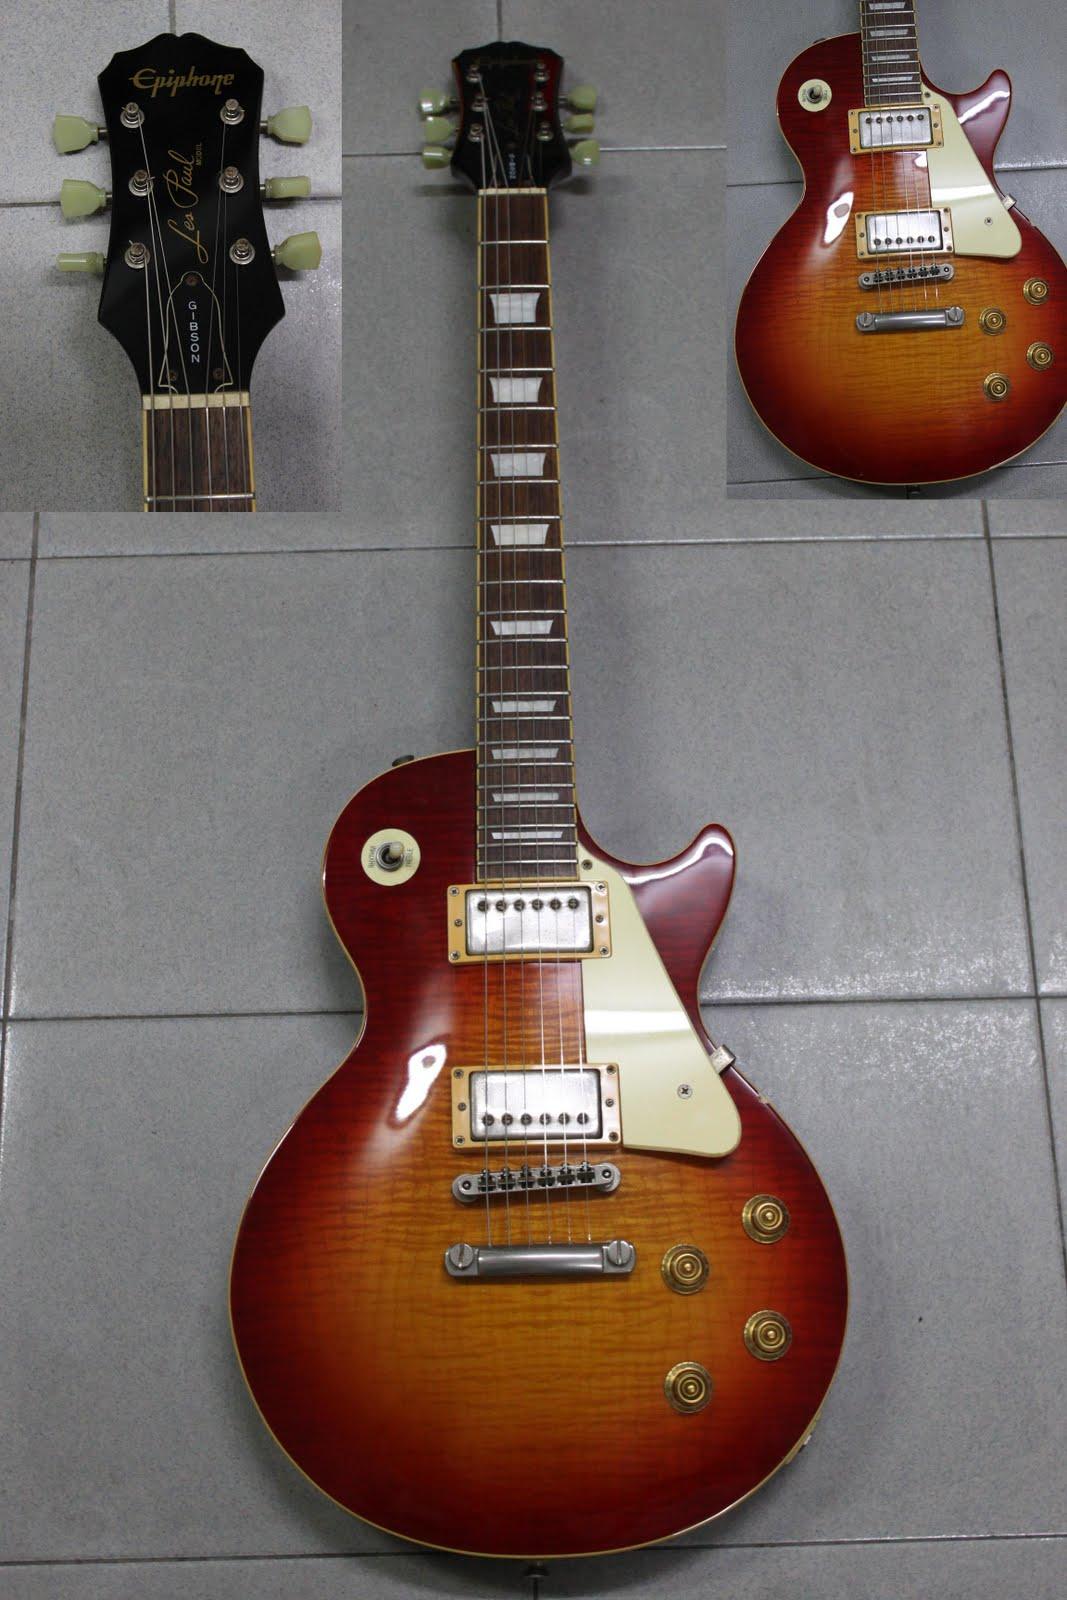 Pre-Owned Guitars @ OtokoMusic: Otoko Music - EPIPHONE